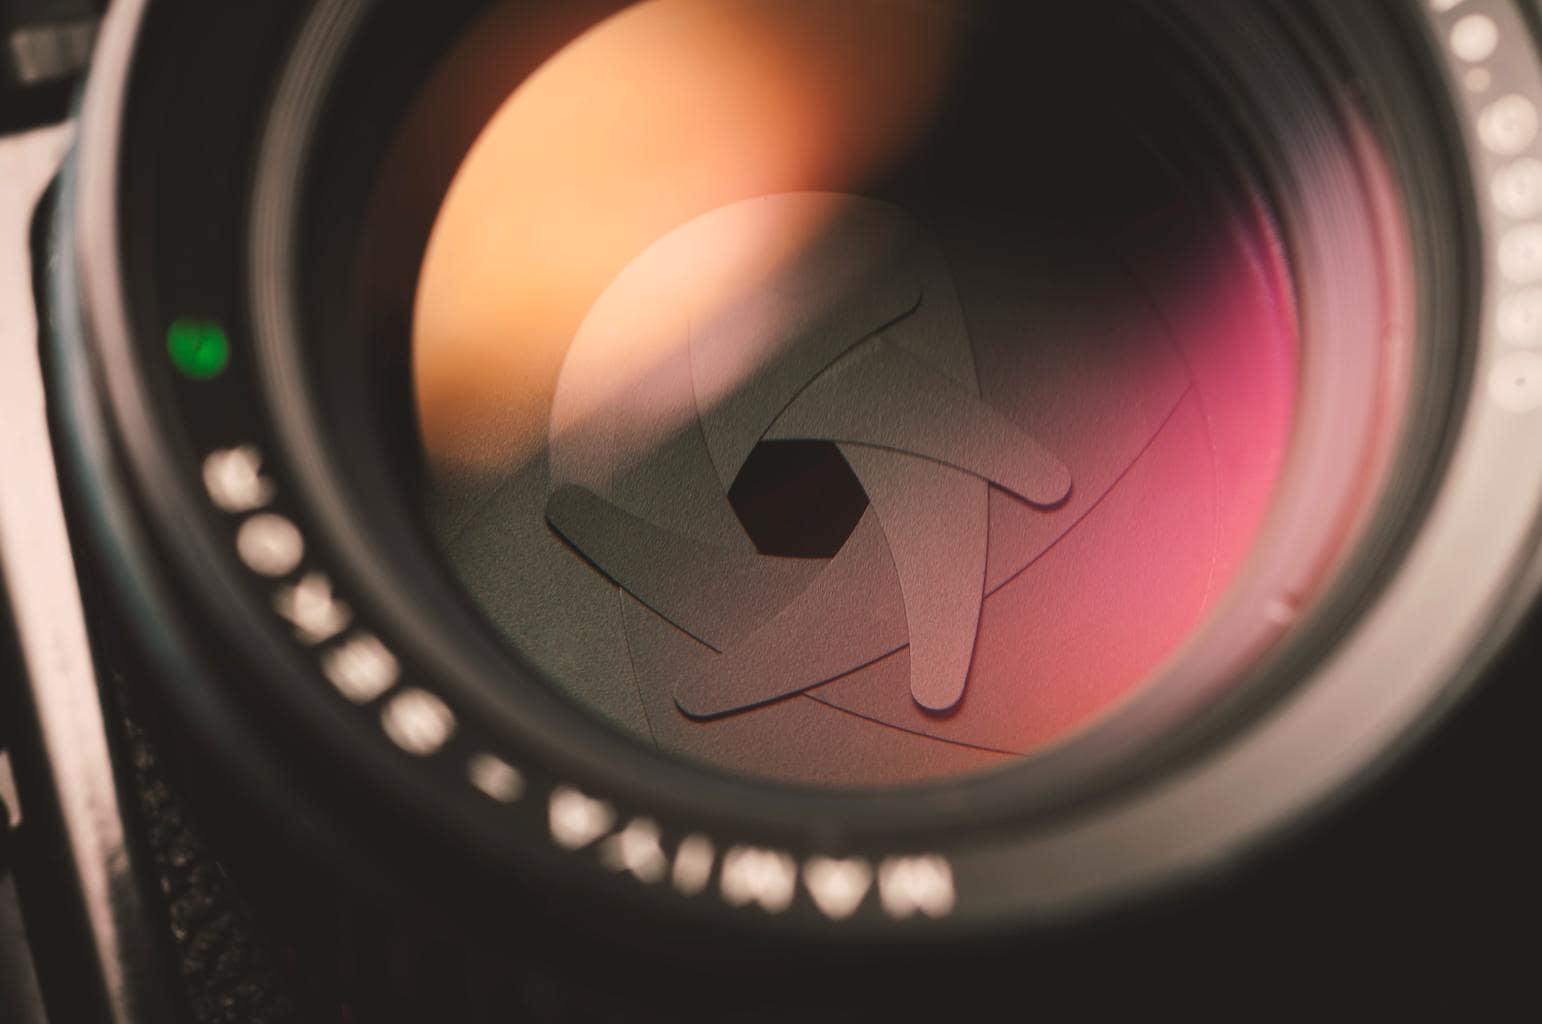 Diafragma de una cámara